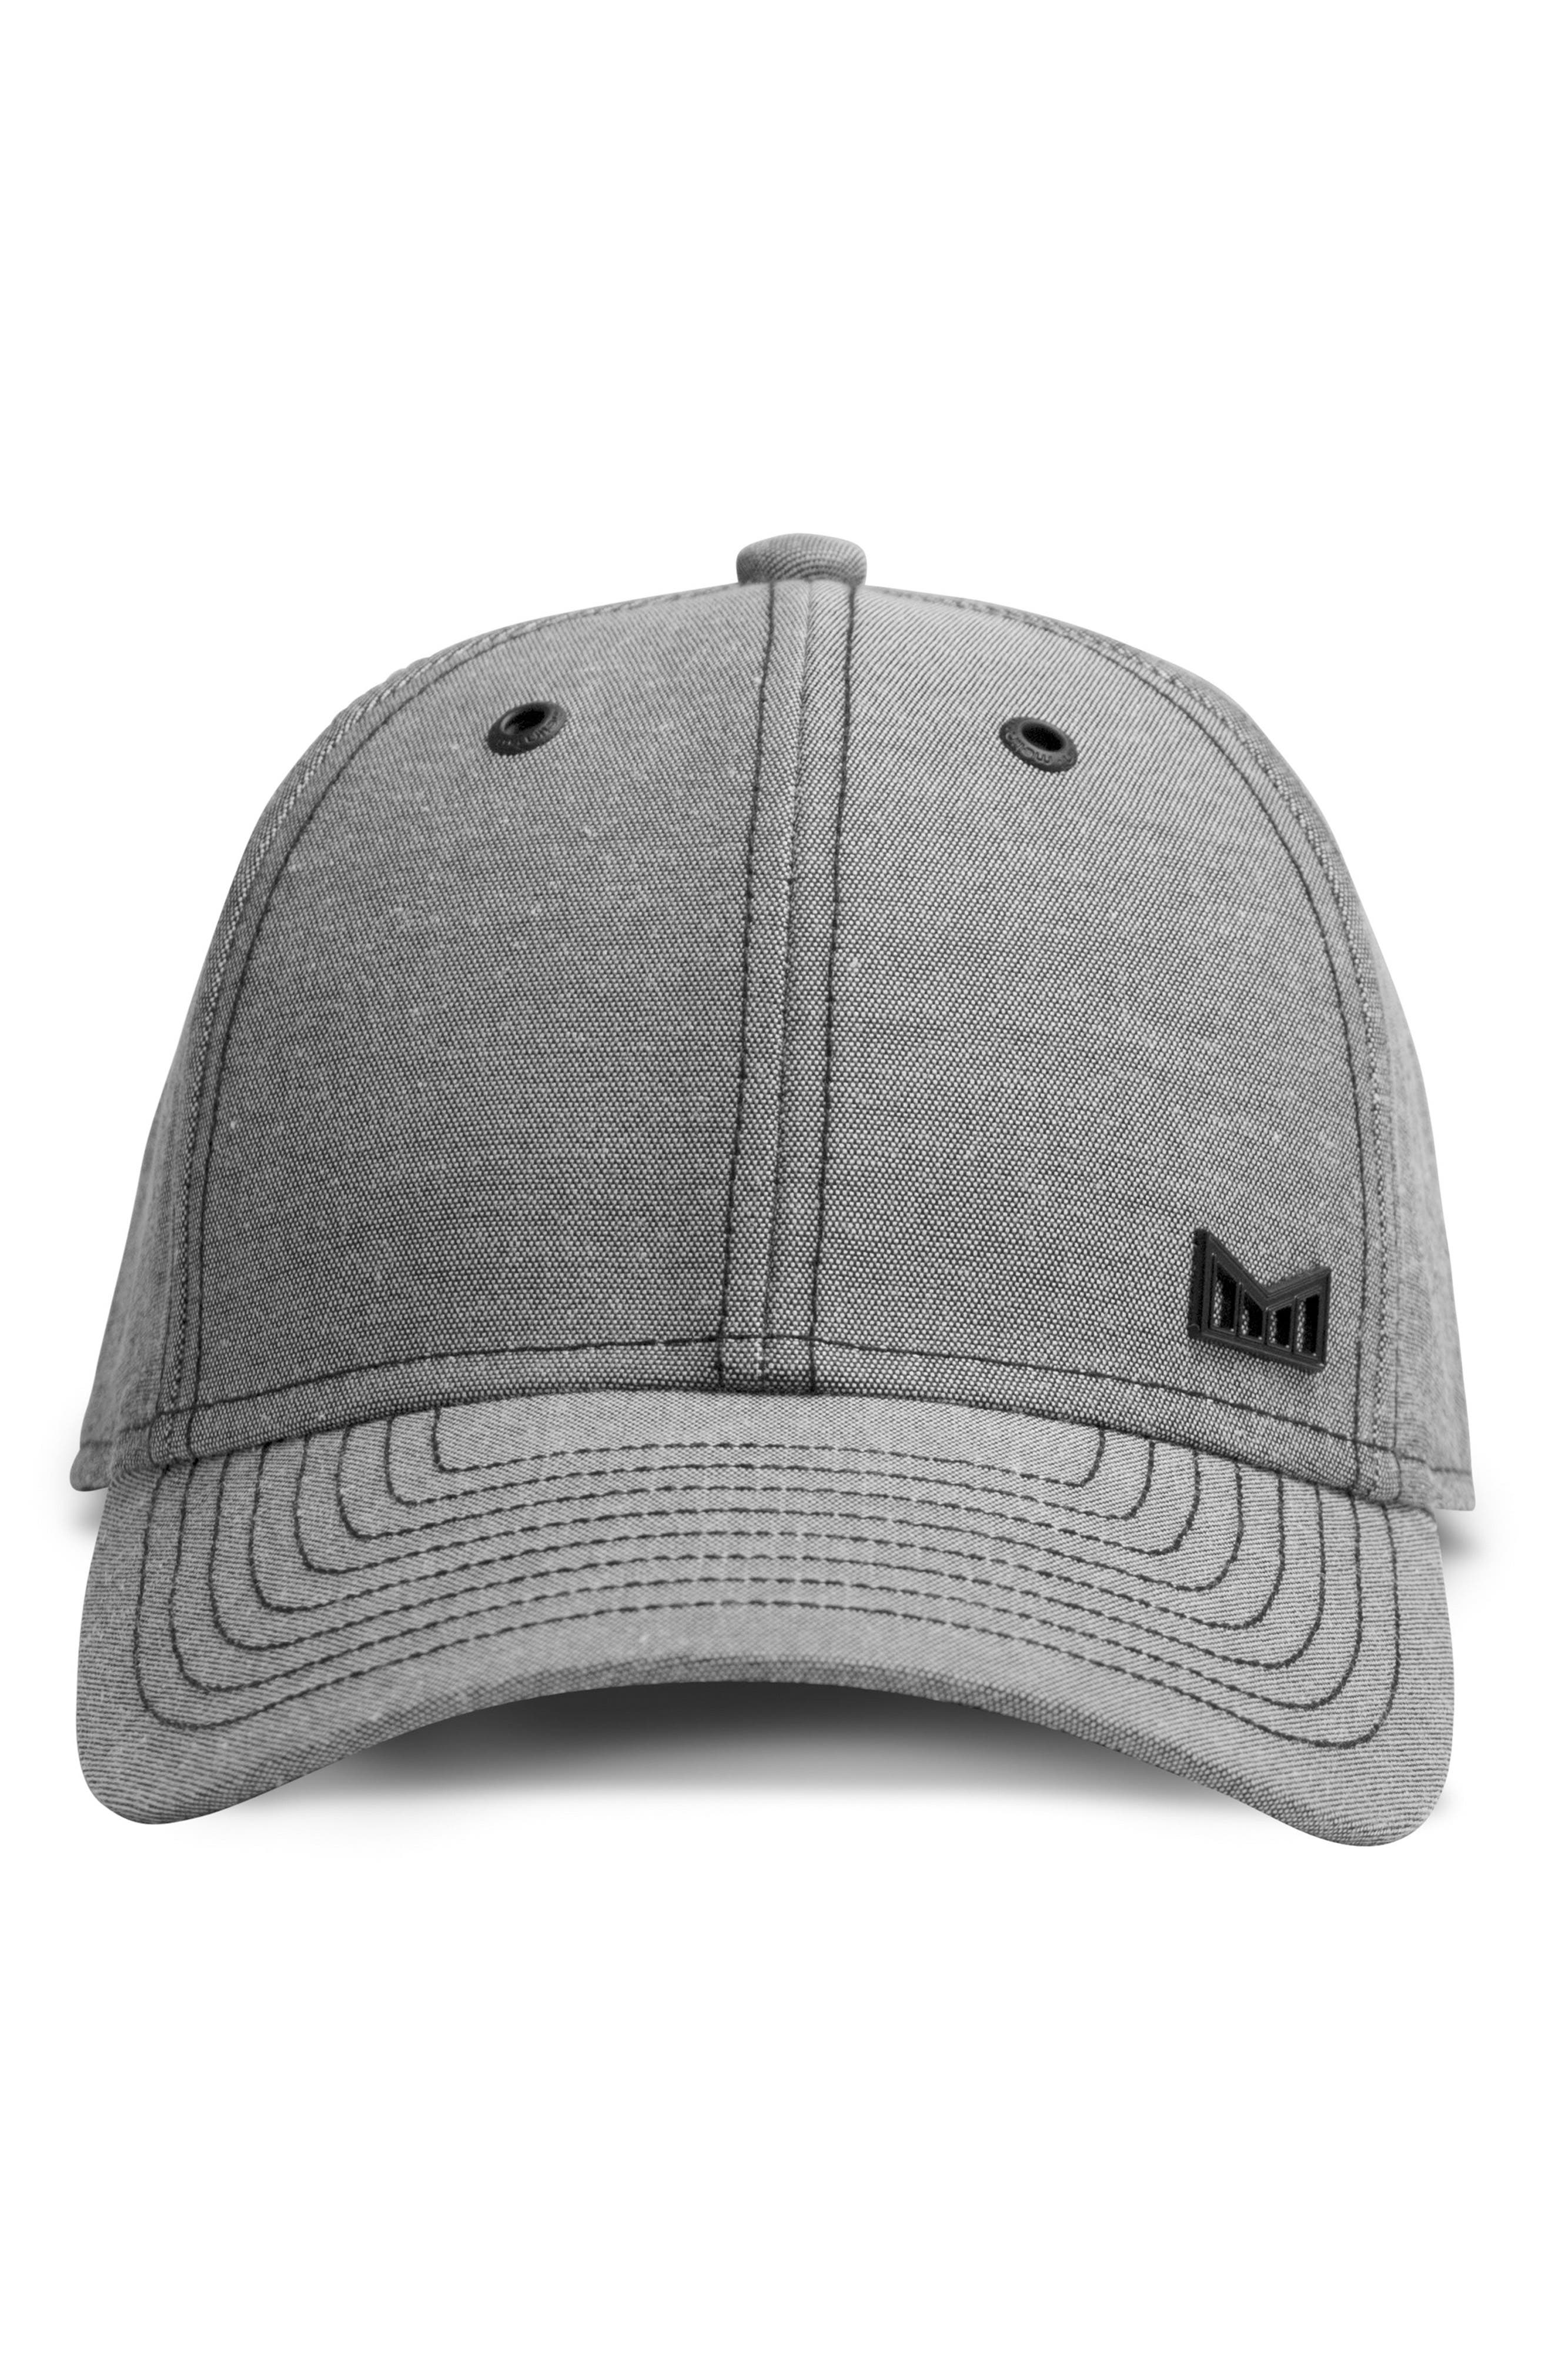 Scholar Snapback Baseball Cap,                             Alternate thumbnail 6, color,                             Black